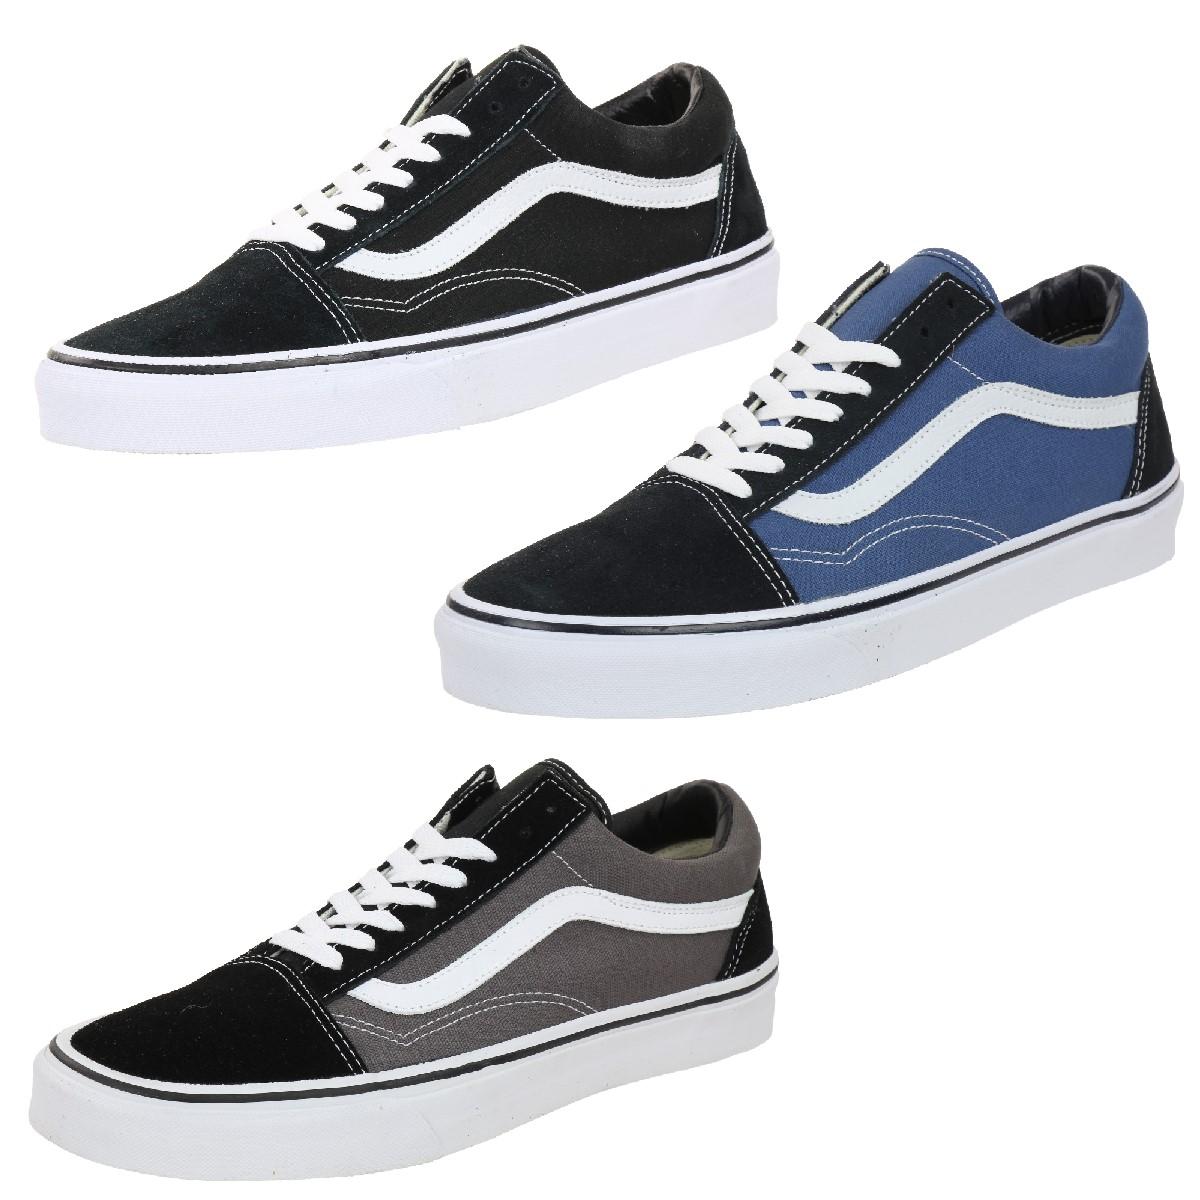 VANS Old Skool Classic Sneaker Skate Schuhe Klassiker Marke